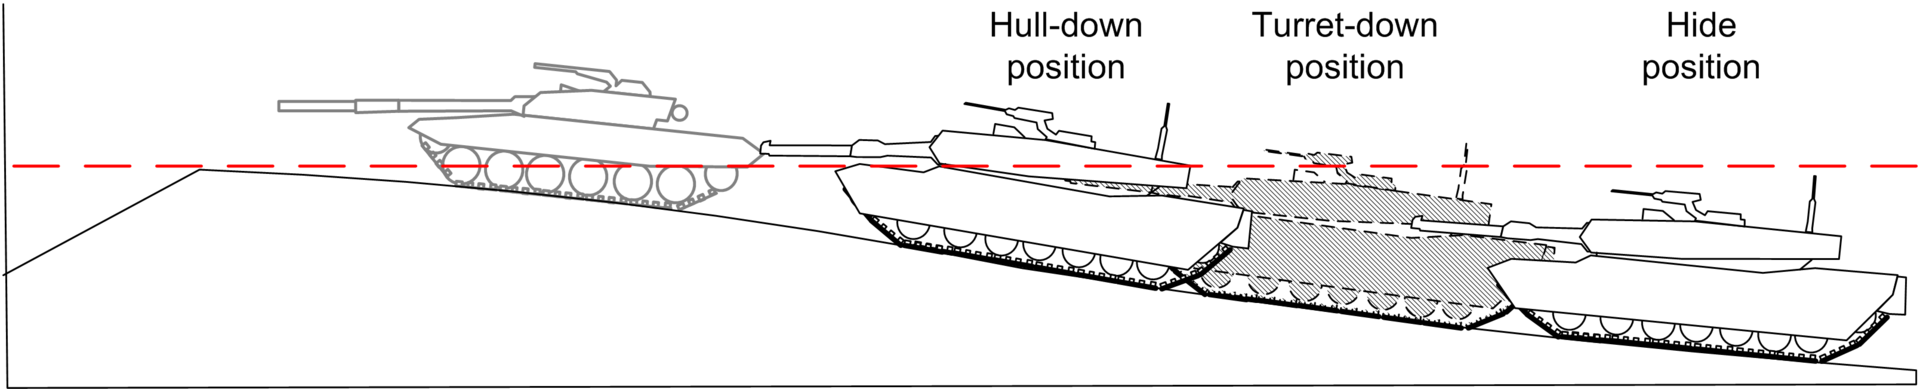 1920px-Hull_down_tank_diagram.png